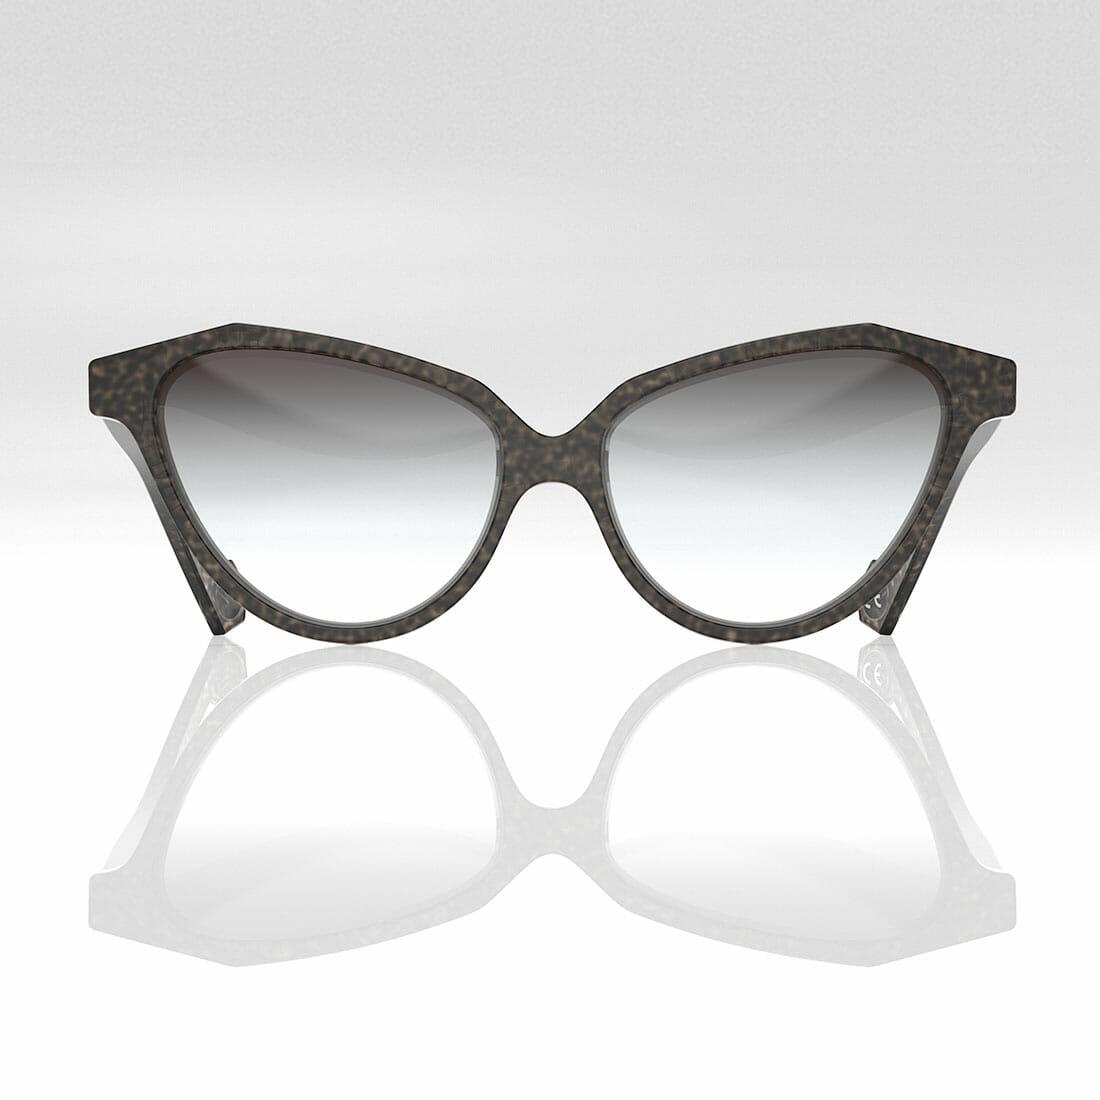 ZEROUNDICI Eyewear Occhiale S09r1 Designer Alberto De Siati